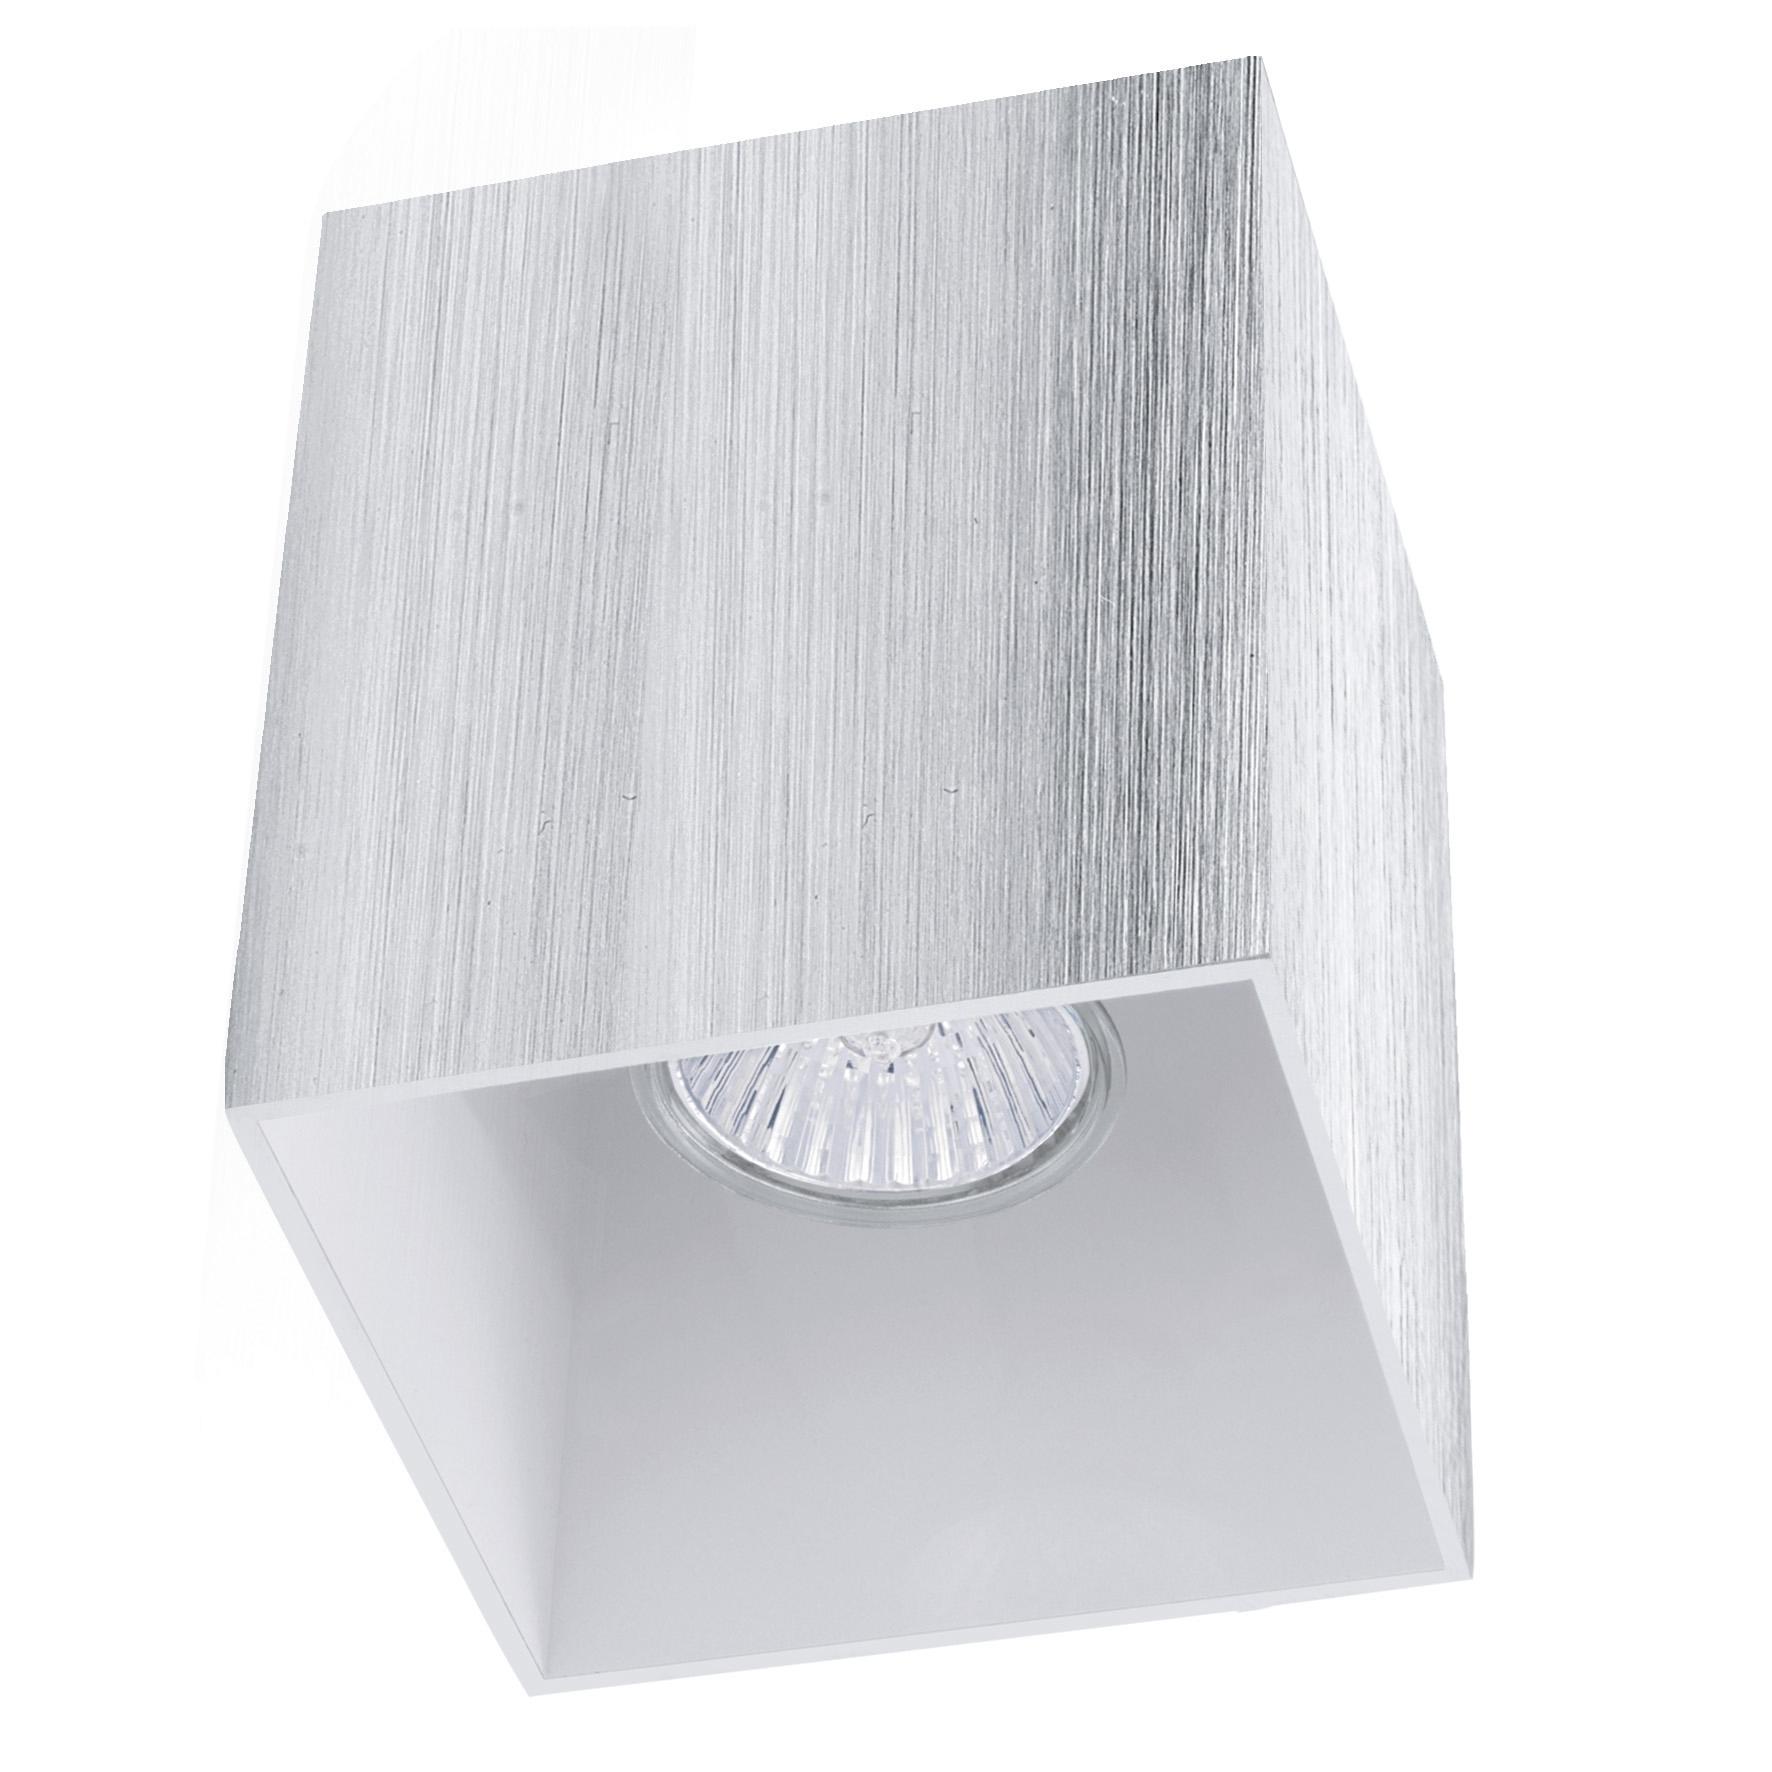 eglo-downlight-bantry-metallisch-aluminium-91195